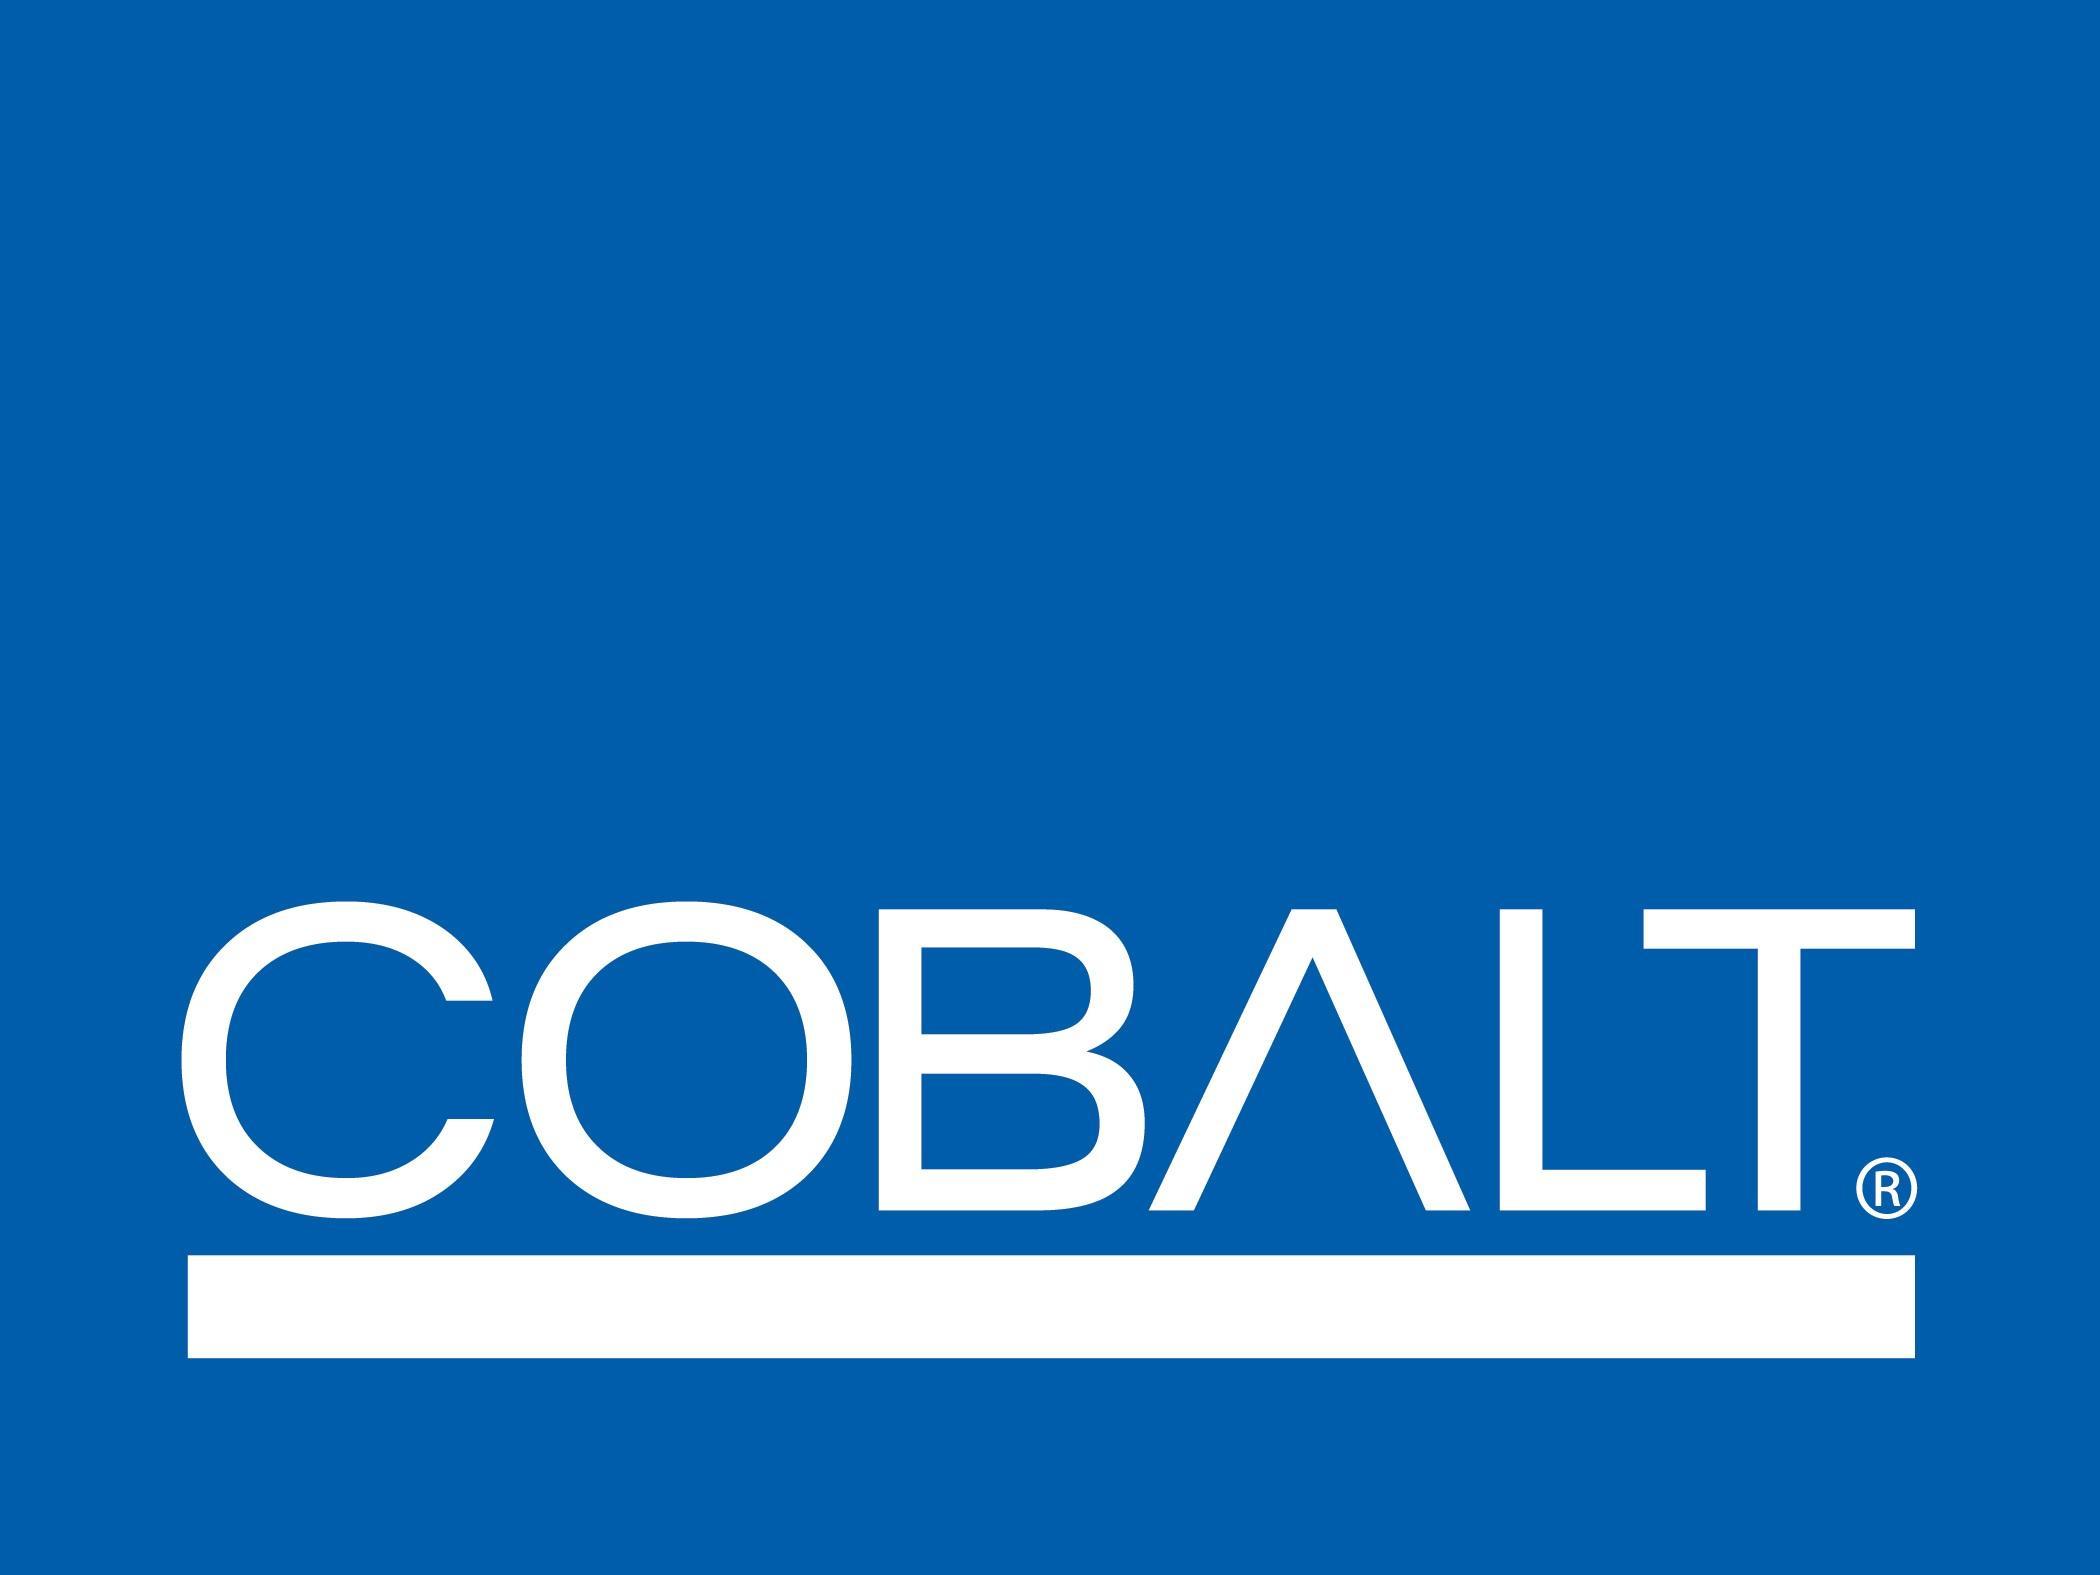 Cobalt Digital RM20-9970-QS-MC-C-HDBNC 20-Slot Frame Rear I/O Module 3G/HD-SD-SDI/CVBS/COMM/GPIO Port/HDMI/Ethernet Port